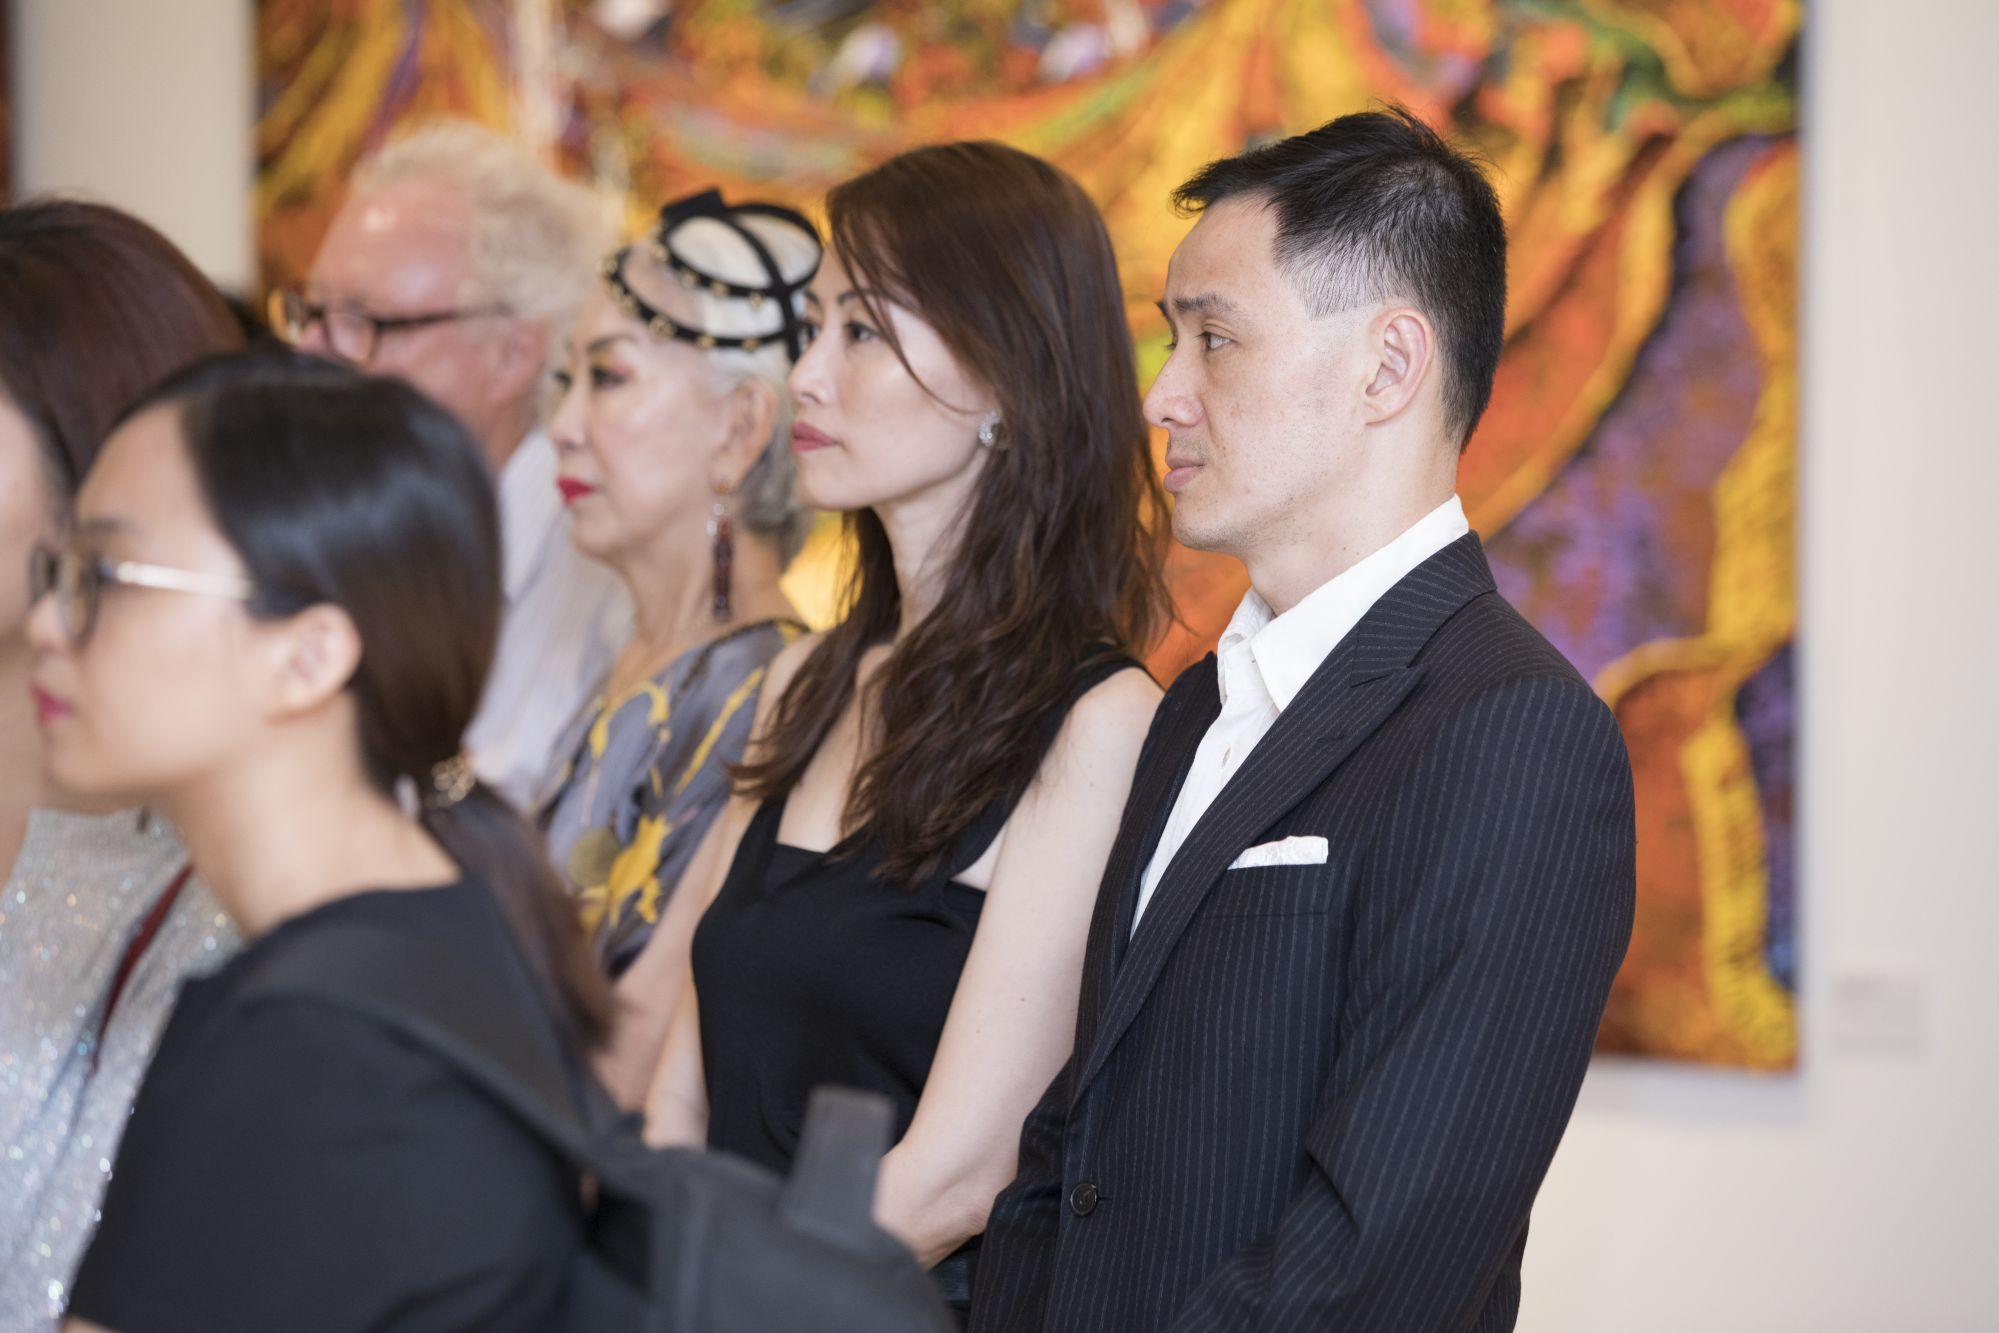 Serene Tan, Benjamin Kim